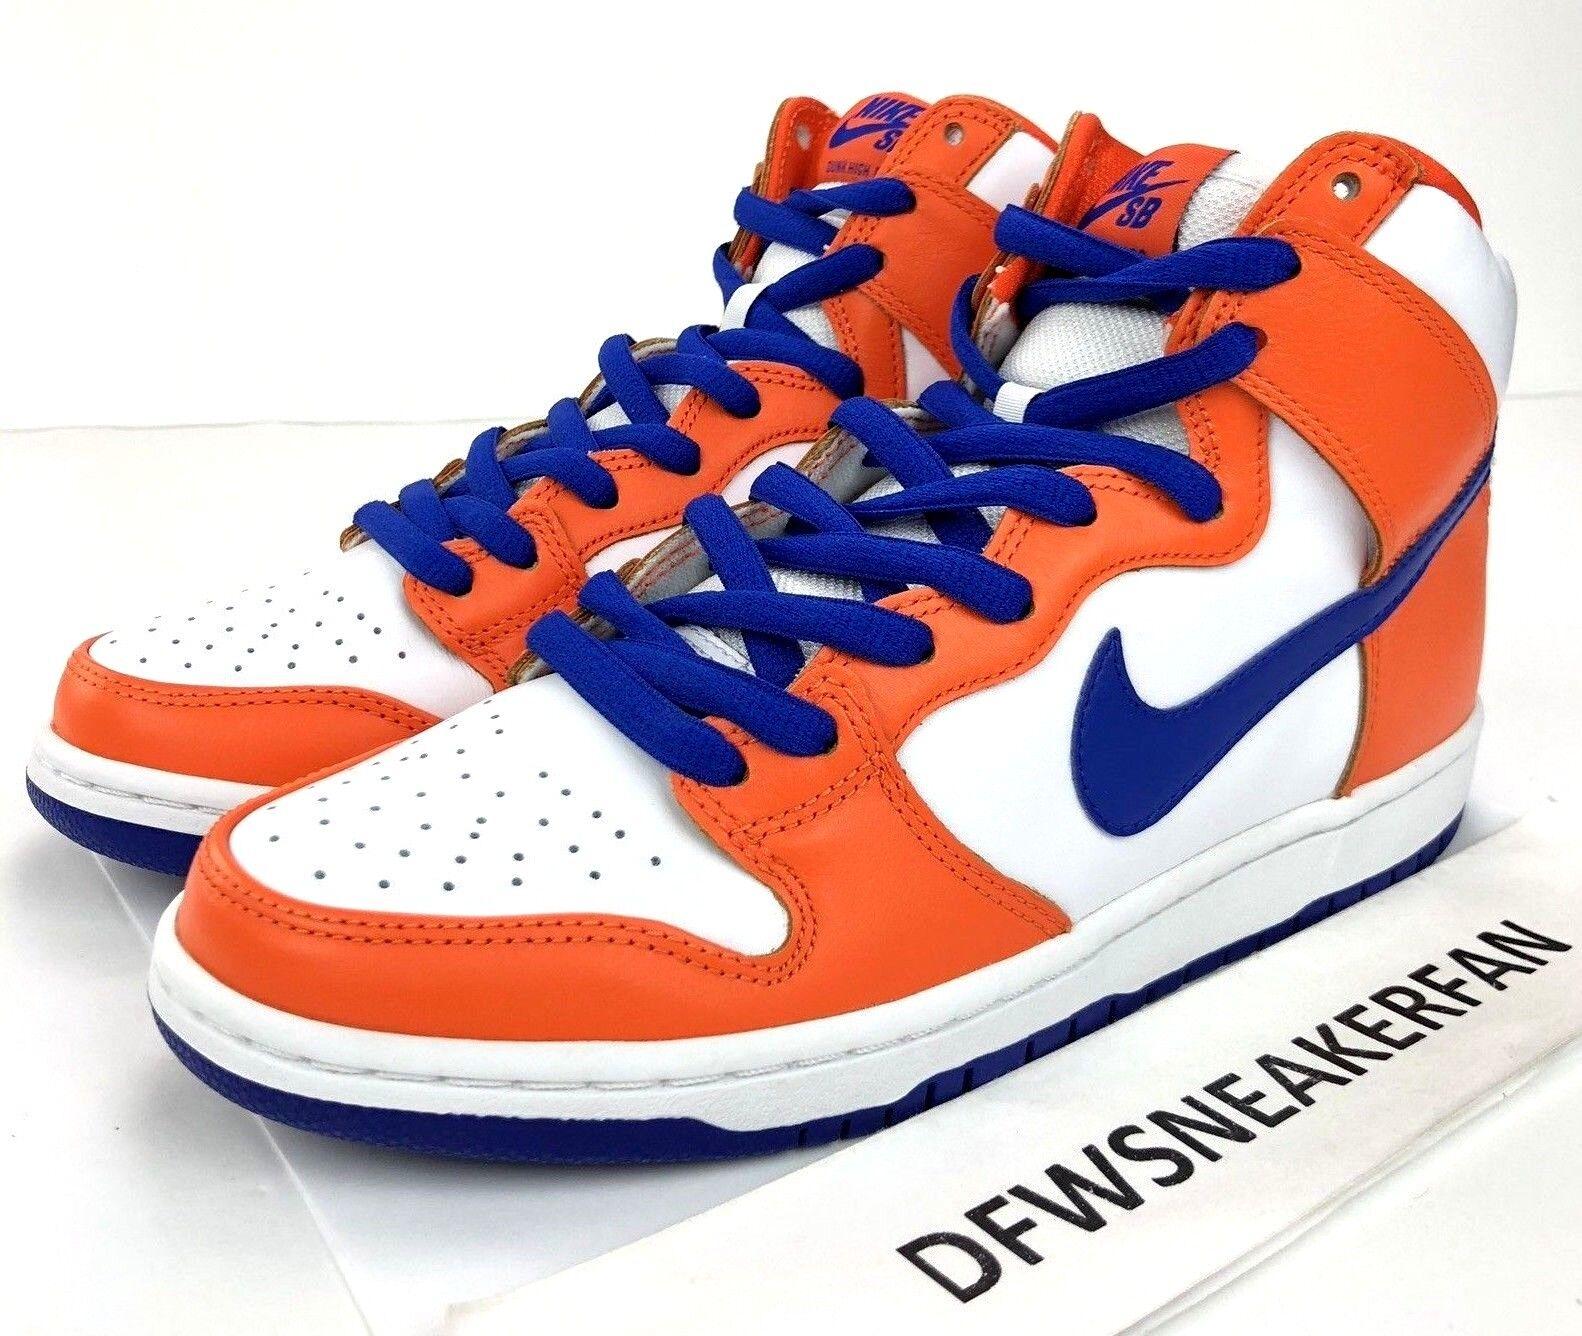 Nike SB Dunk Hi TRD QS  Danny Supa  Men Size 10.5 orange bluee AH0471-841 Knicks